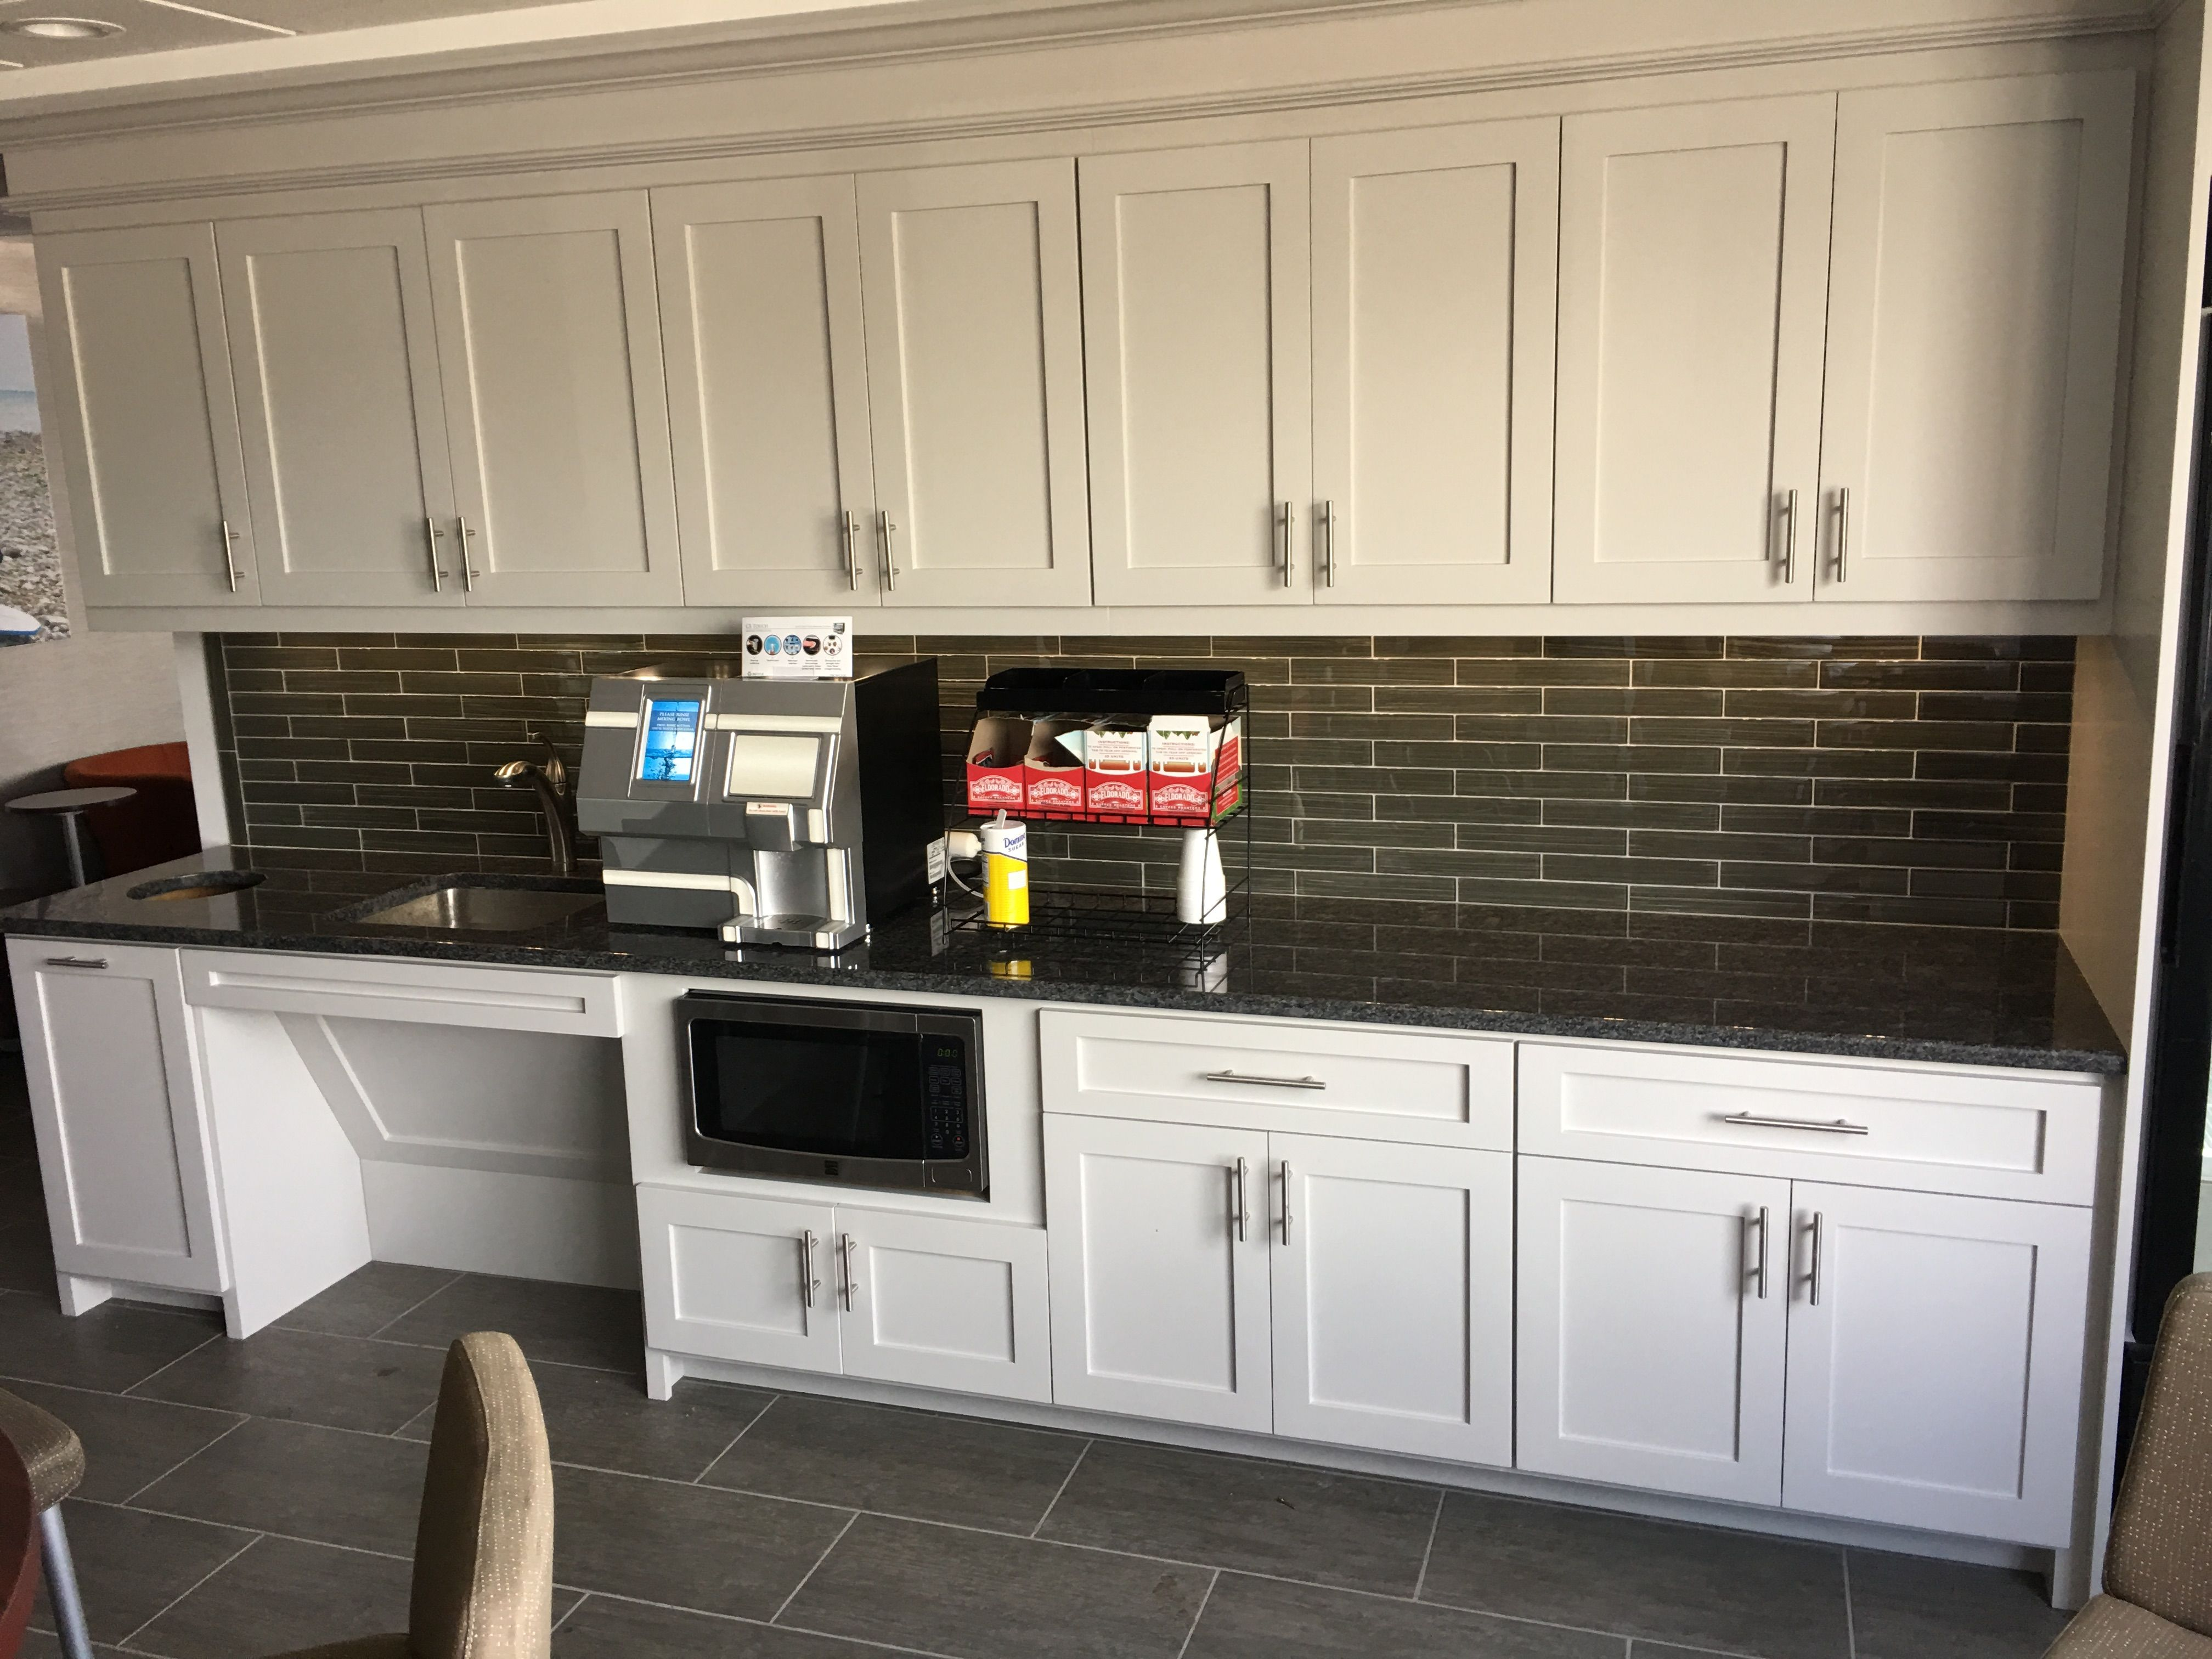 Pin By Cmg On Backsplash Home Decor Decor Kitchen Cabinets